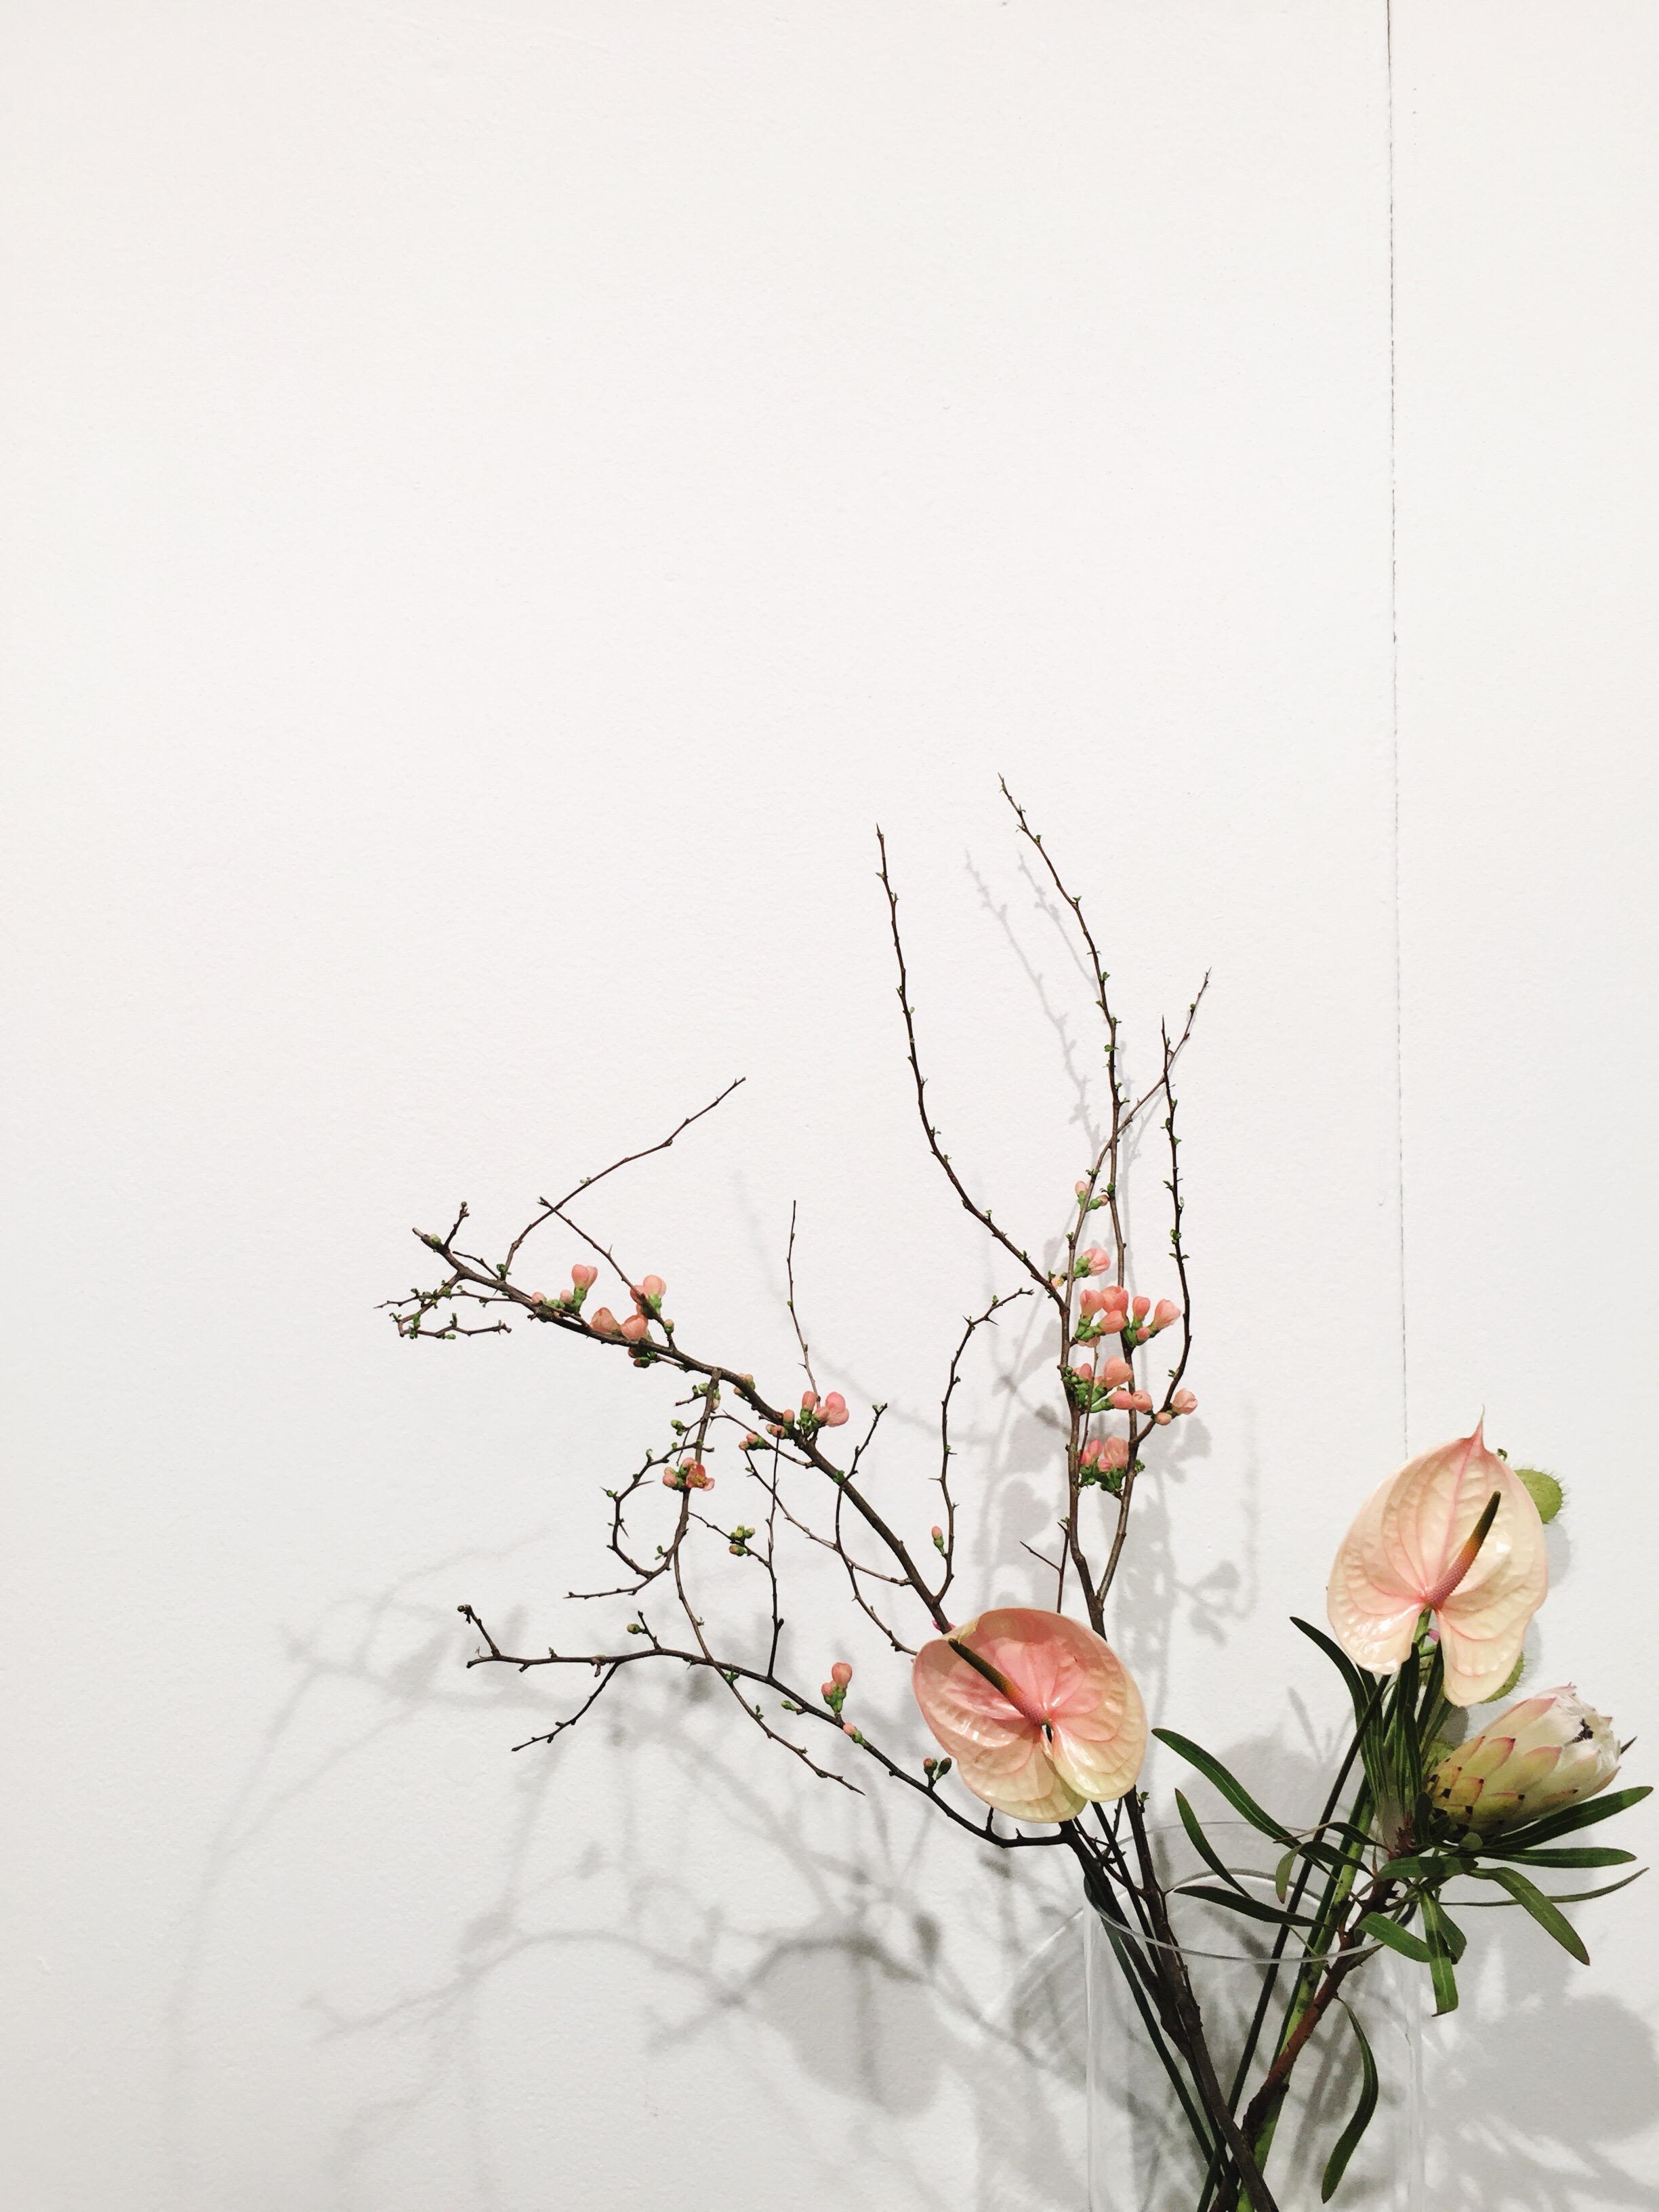 formland_flowers.JPG